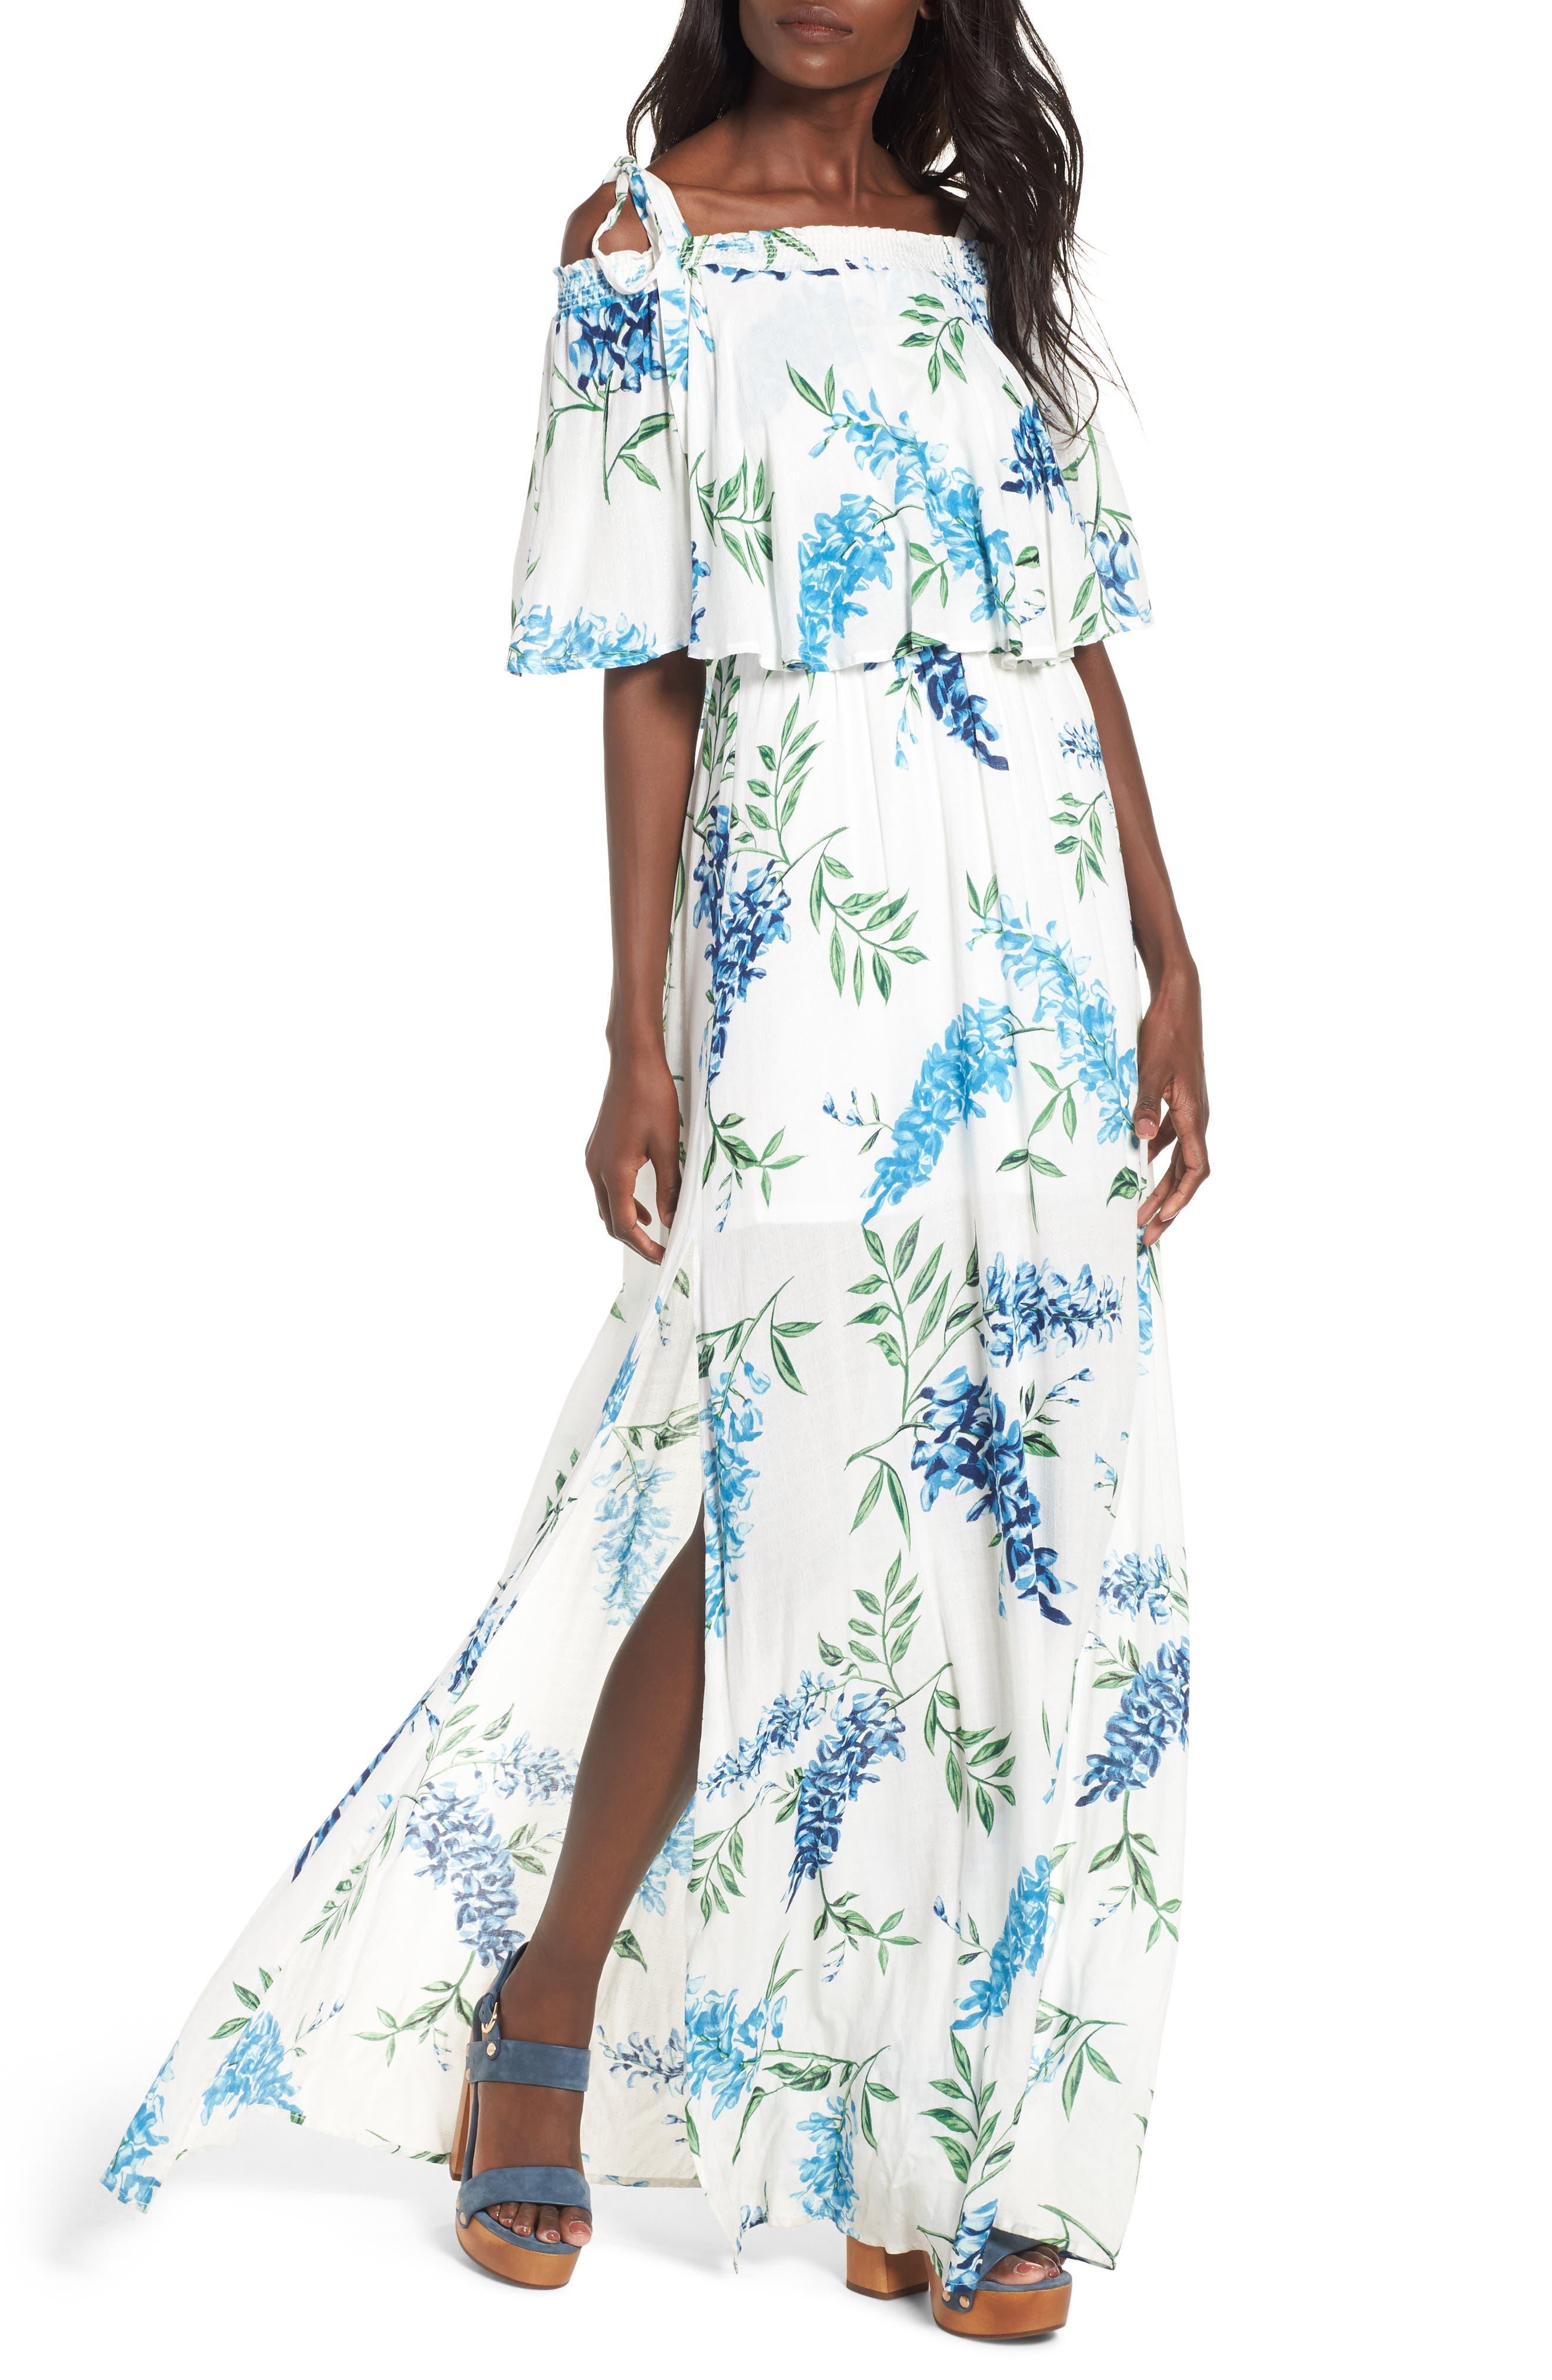 Nicola Ruffle Maxi Dress,                             Main thumbnail 1, color,                             Wisteria Wonder Challis